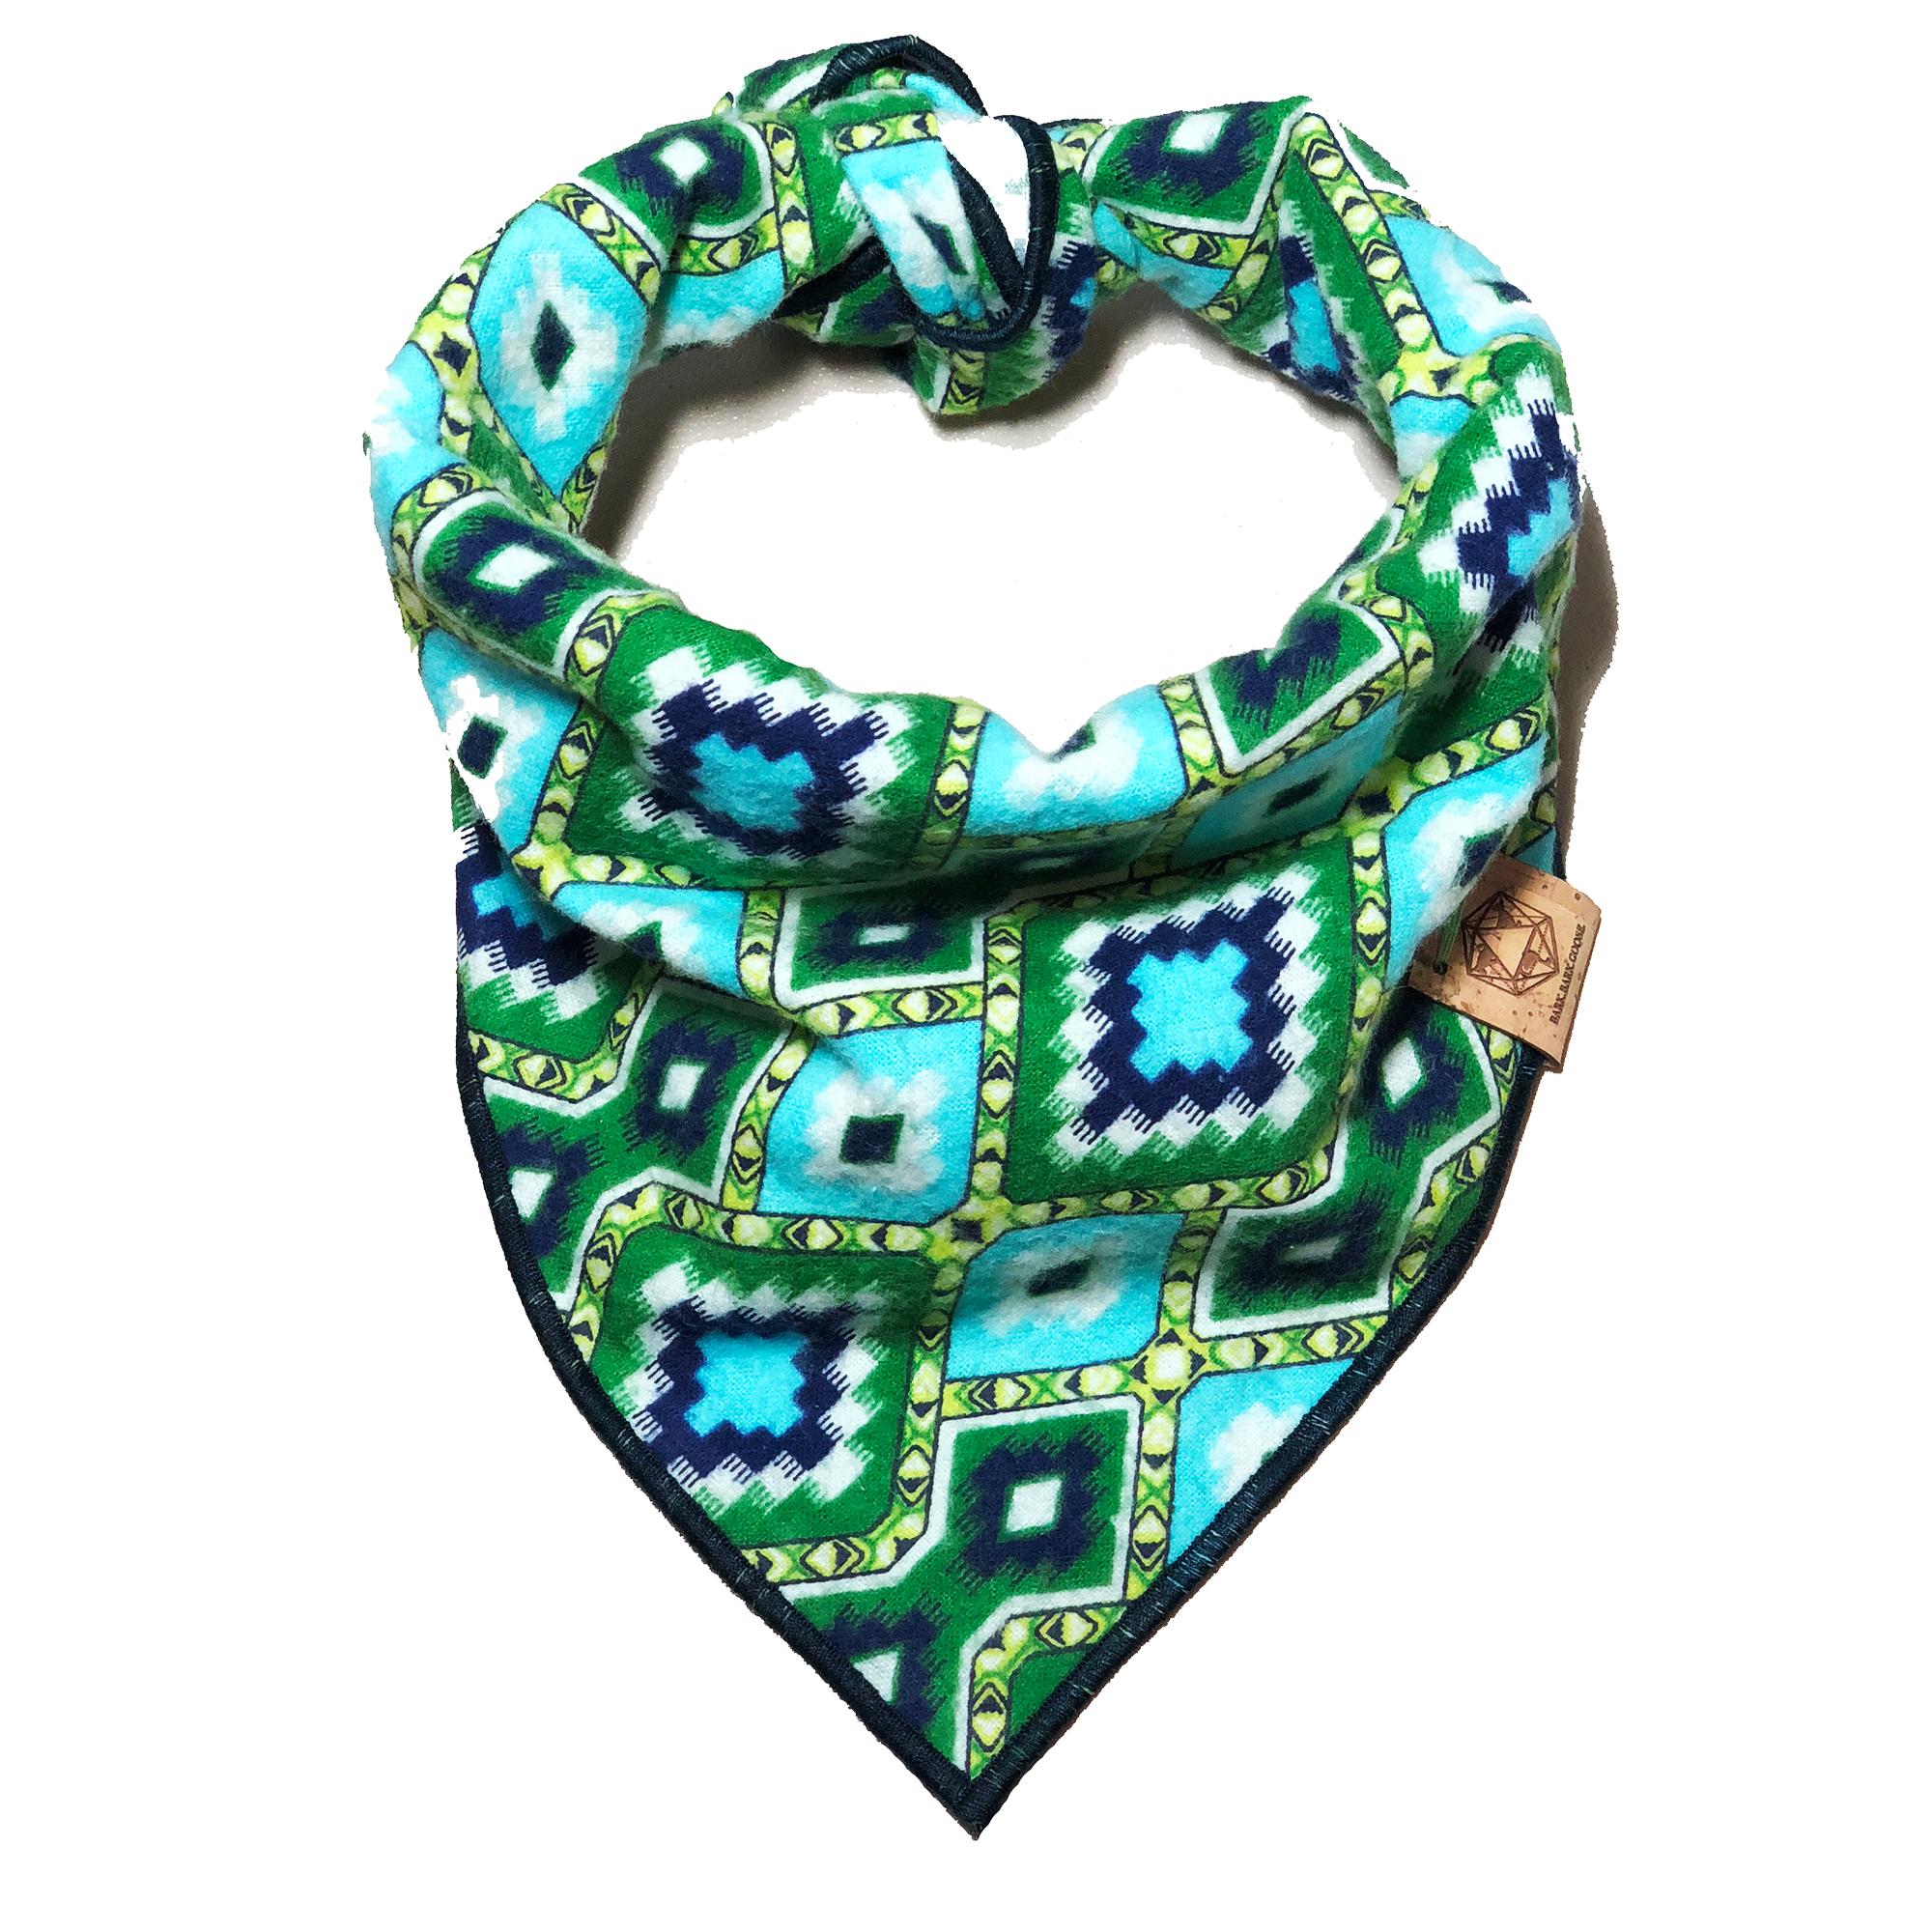 coral-reef-dog-bandana.jpg